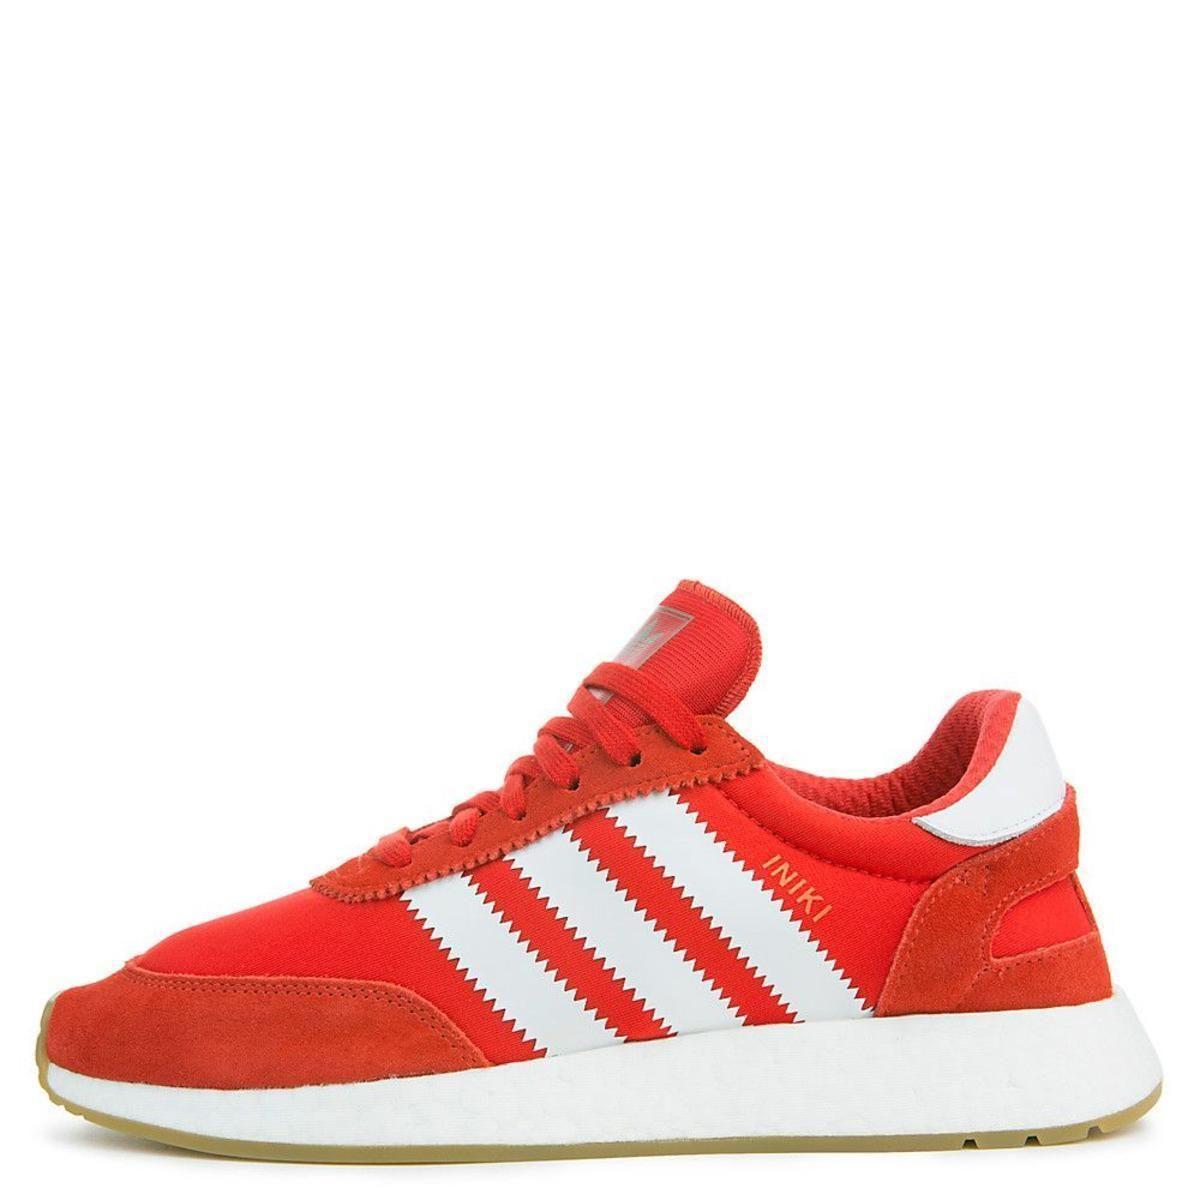 44099ae10f94 Adidas Men s Iniki Runner Sneaker  runnersneaker  adidas  sneakers   shoesformen